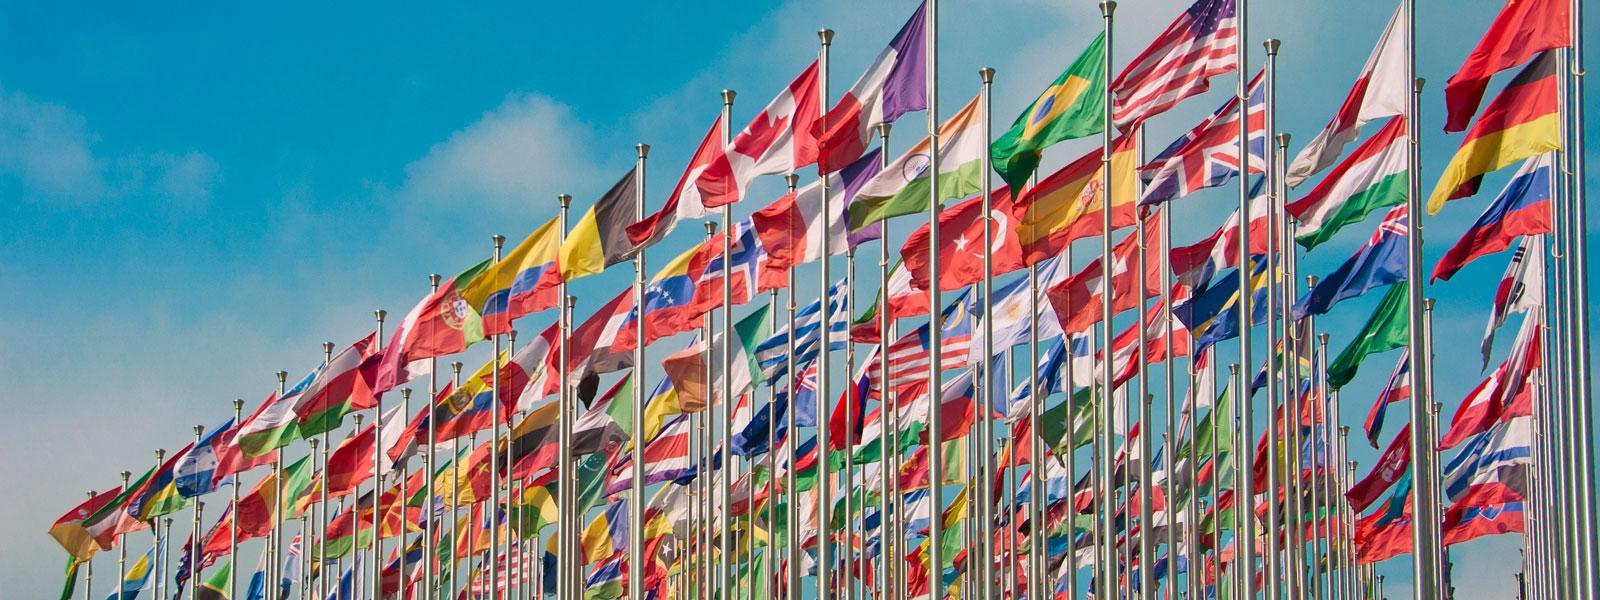 du học Canada ngành quan hệ quốc tế